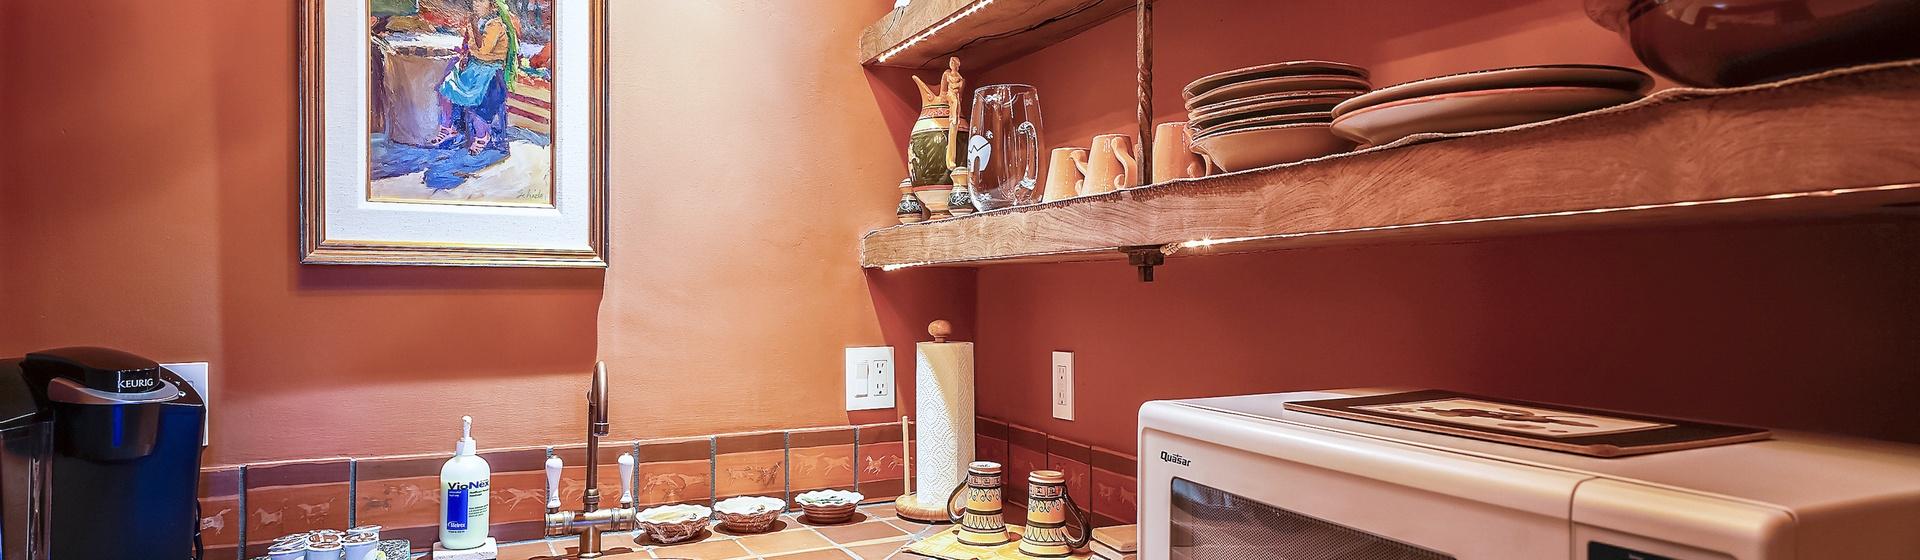 8.4-Telluride-Sleeping-Indian-Ranch-Southwest-Suite-Kitchenette-web.JPG